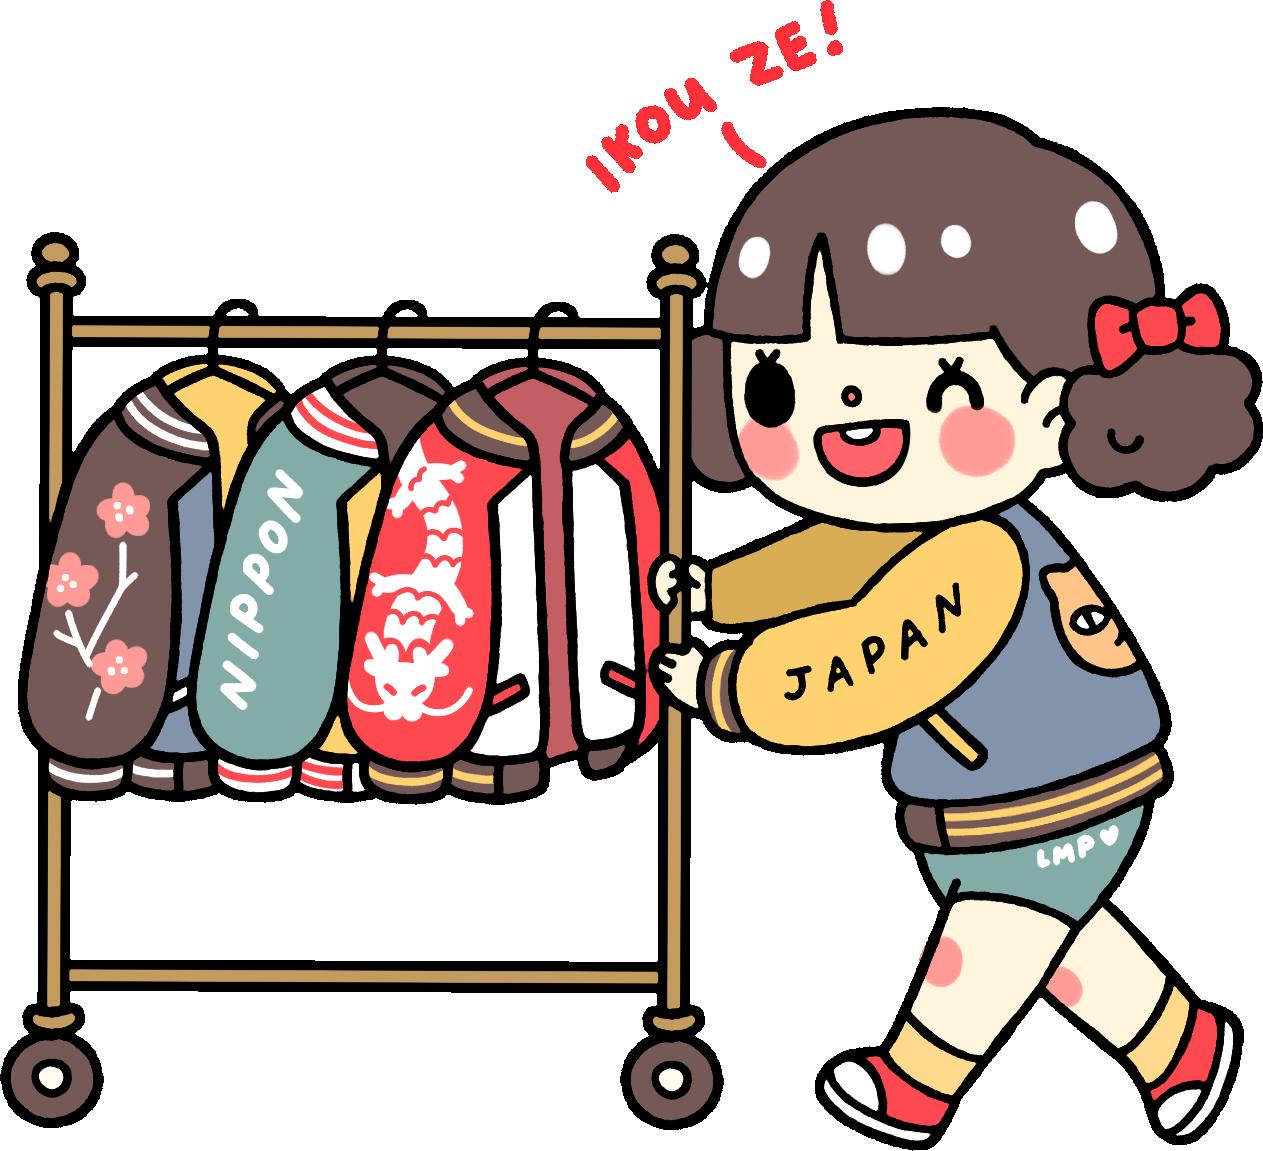 Japanese sukajan souvenir jacket. Youtube clipart bape